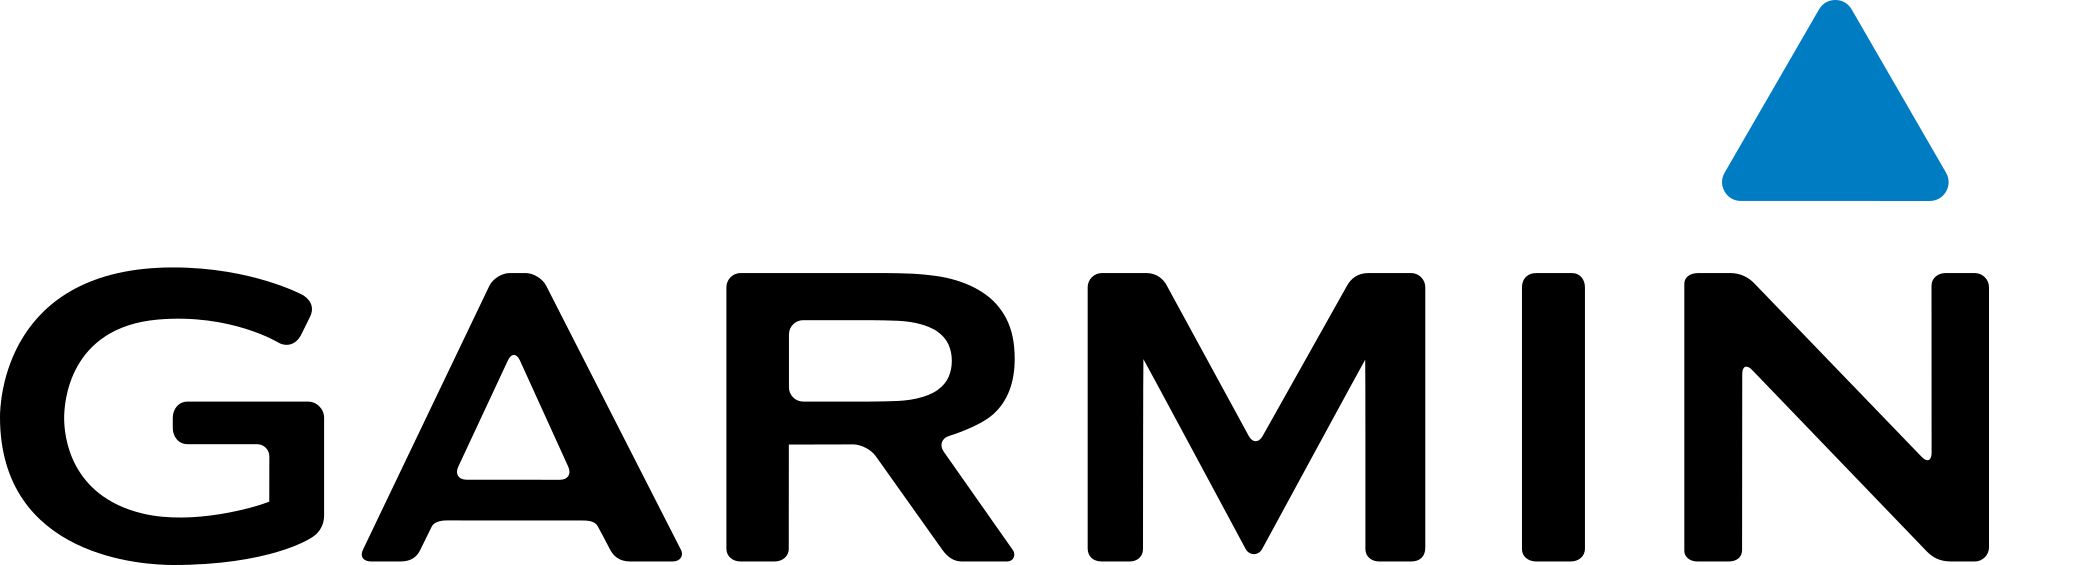 Garmin logo 3 - Garmin Logo